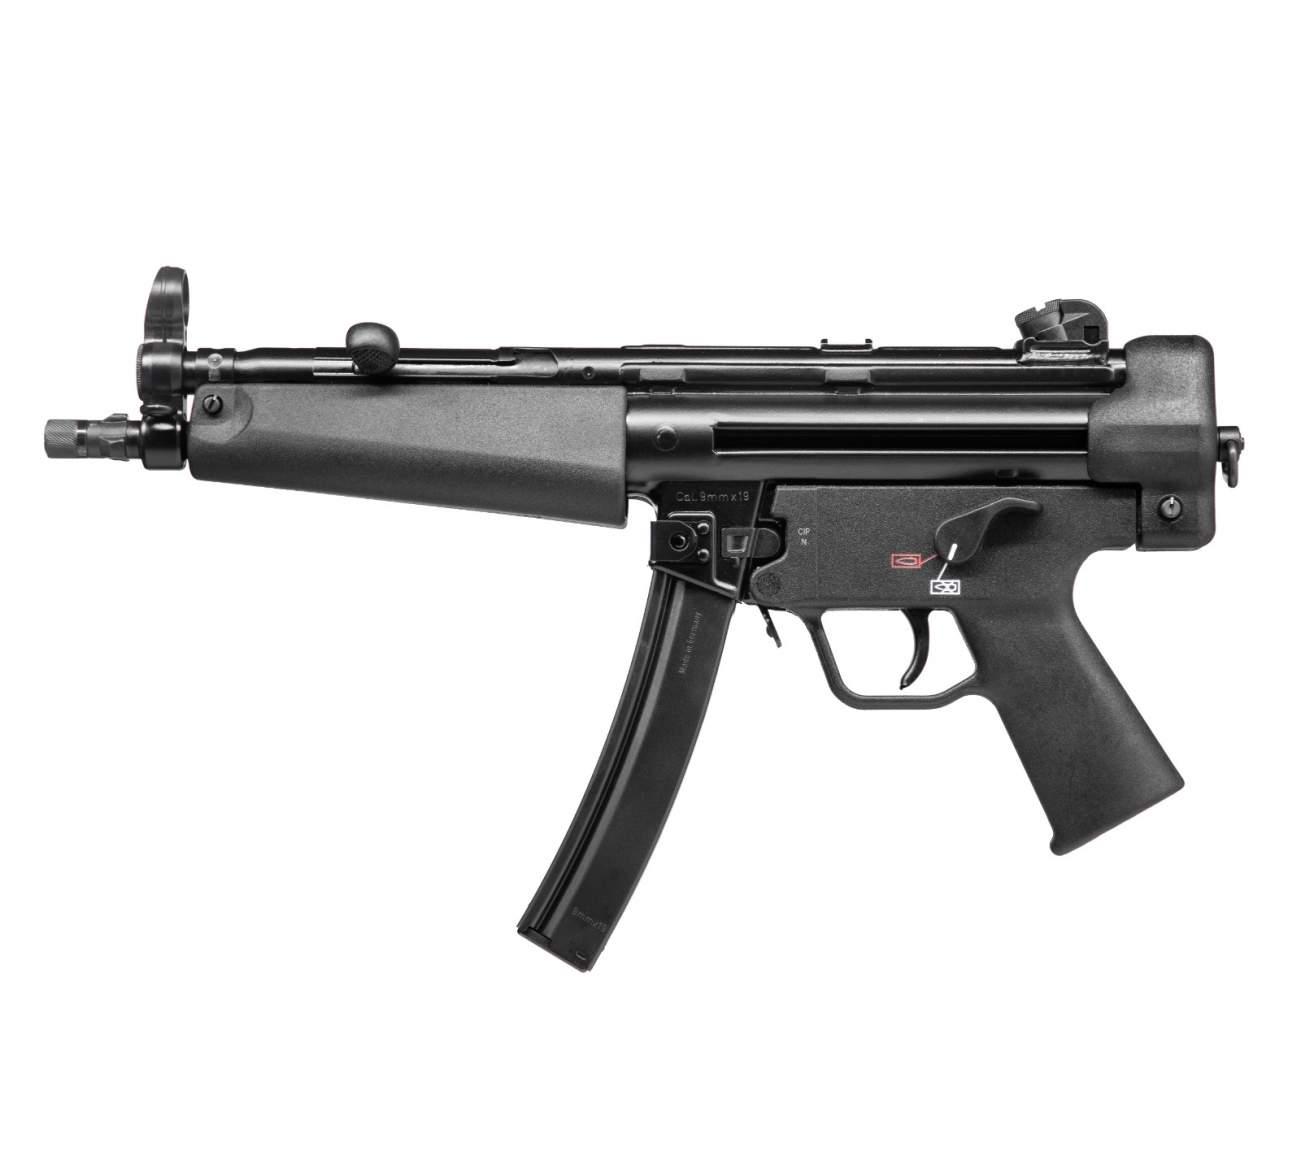 H&K SP5: The Best Pistol Caliber Carbine on the Planet?